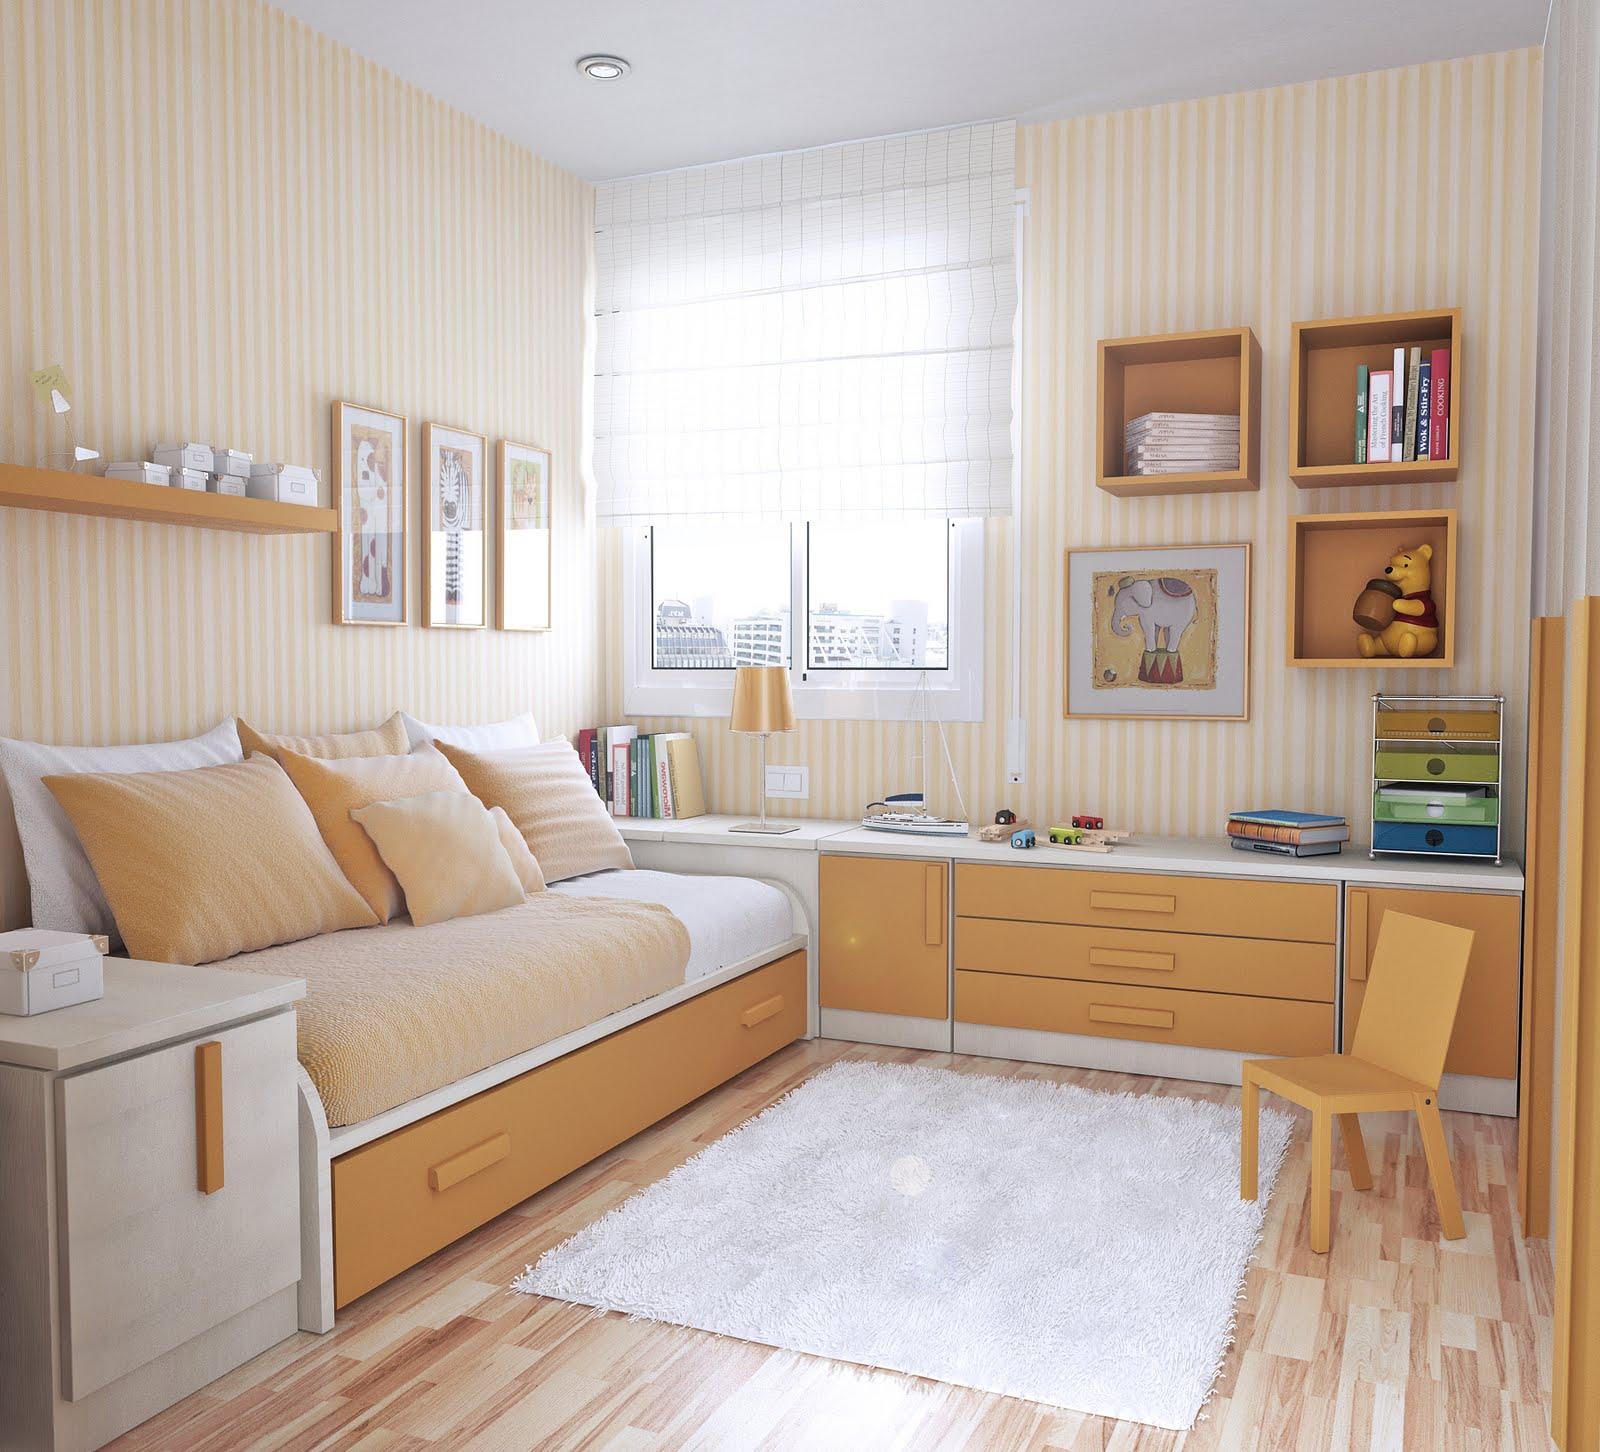 pin pokoj dziecka on pinterest. Black Bedroom Furniture Sets. Home Design Ideas